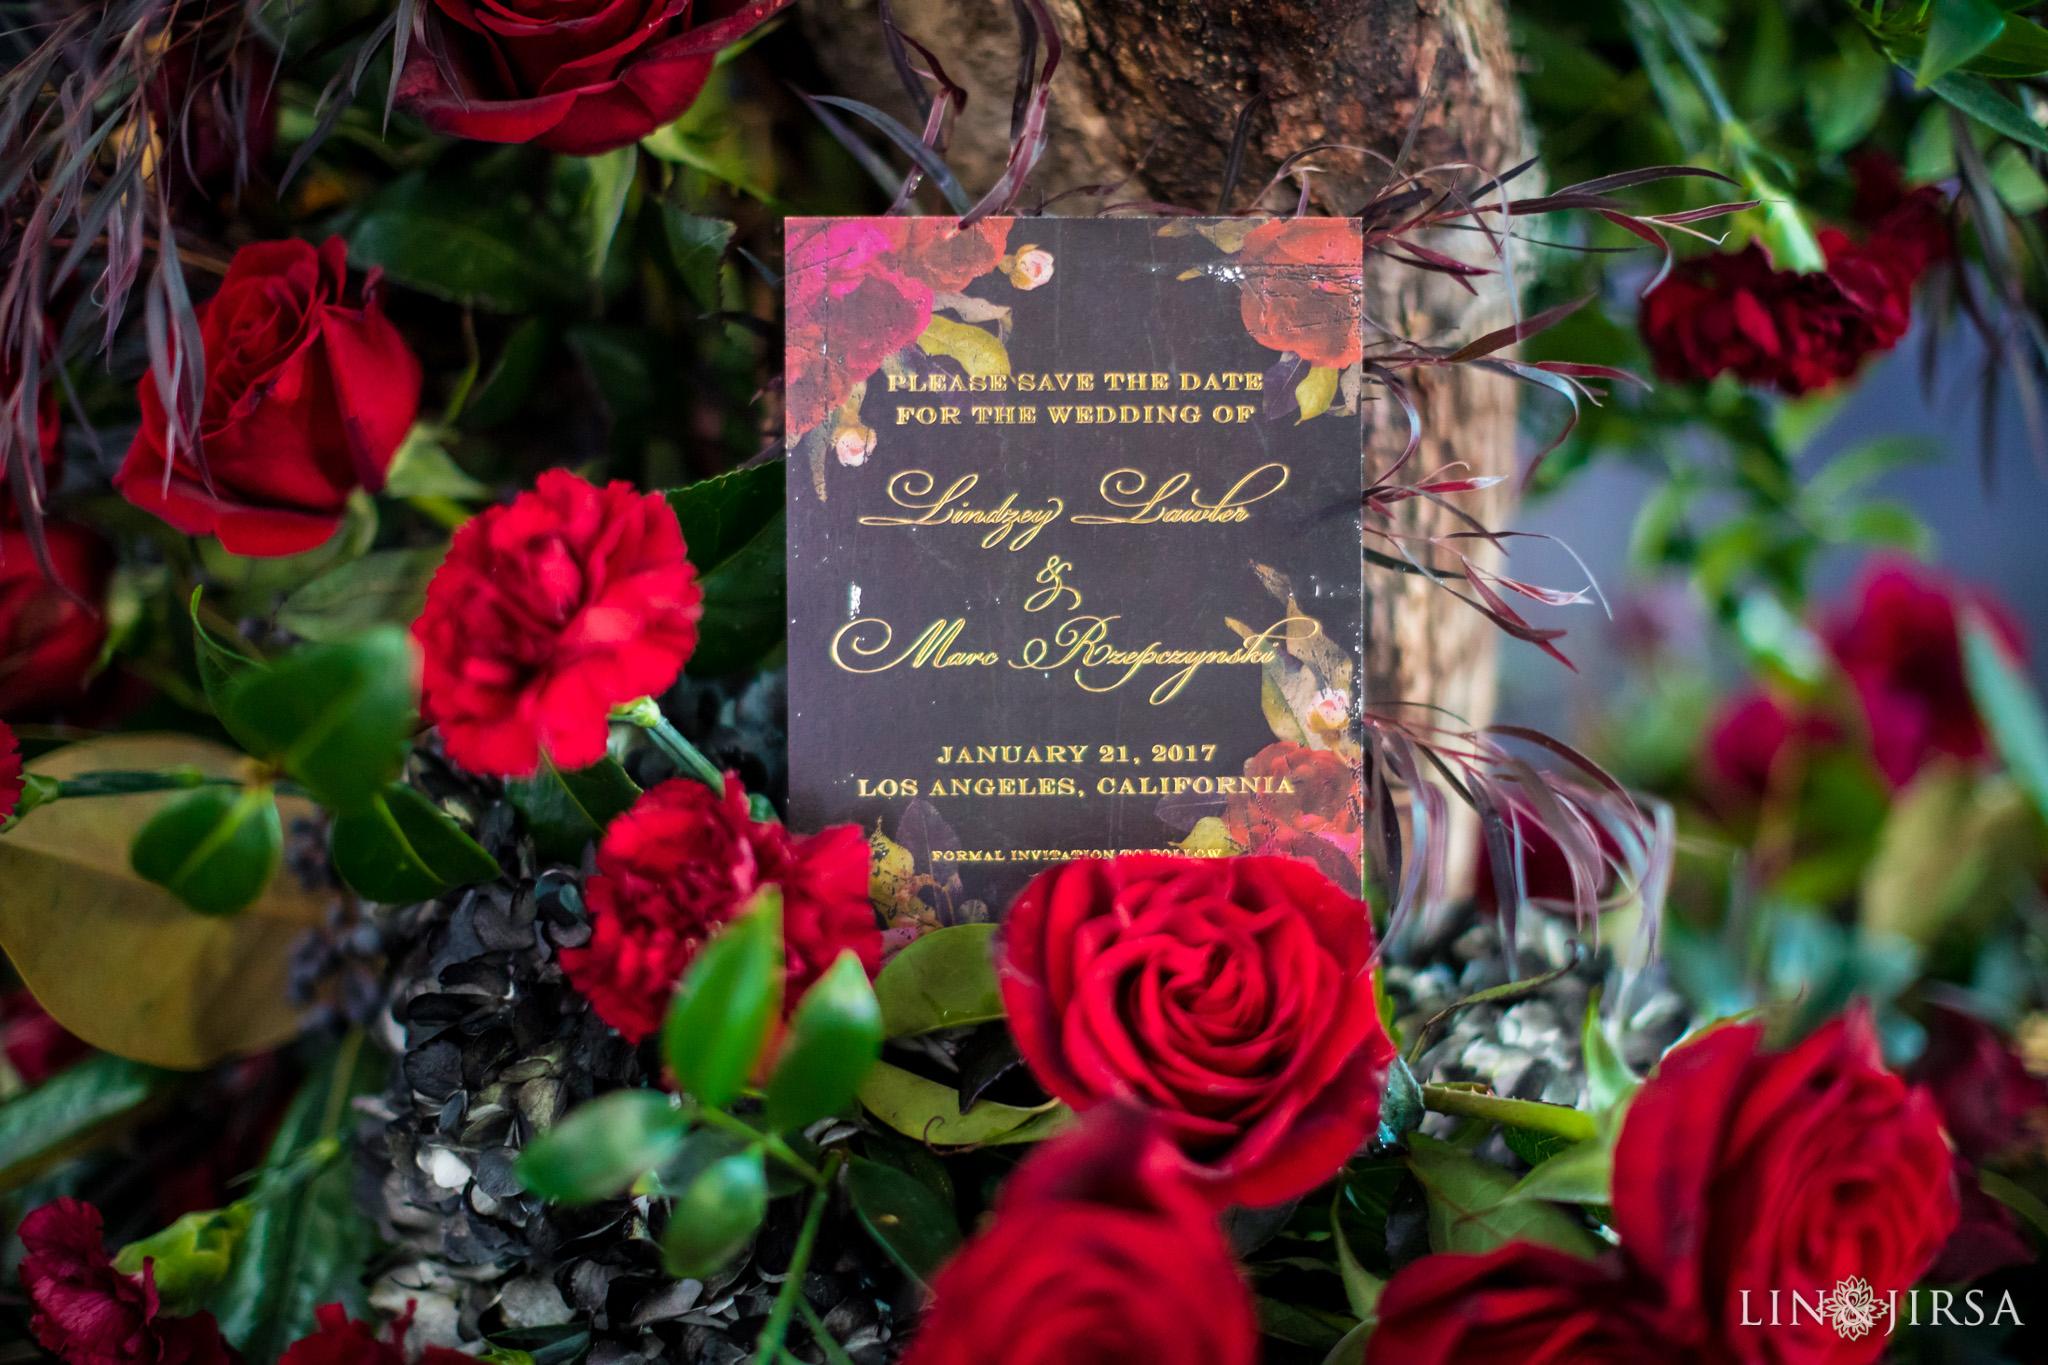 Vibiana Los Angeles Wedding | Lindzey & Marc